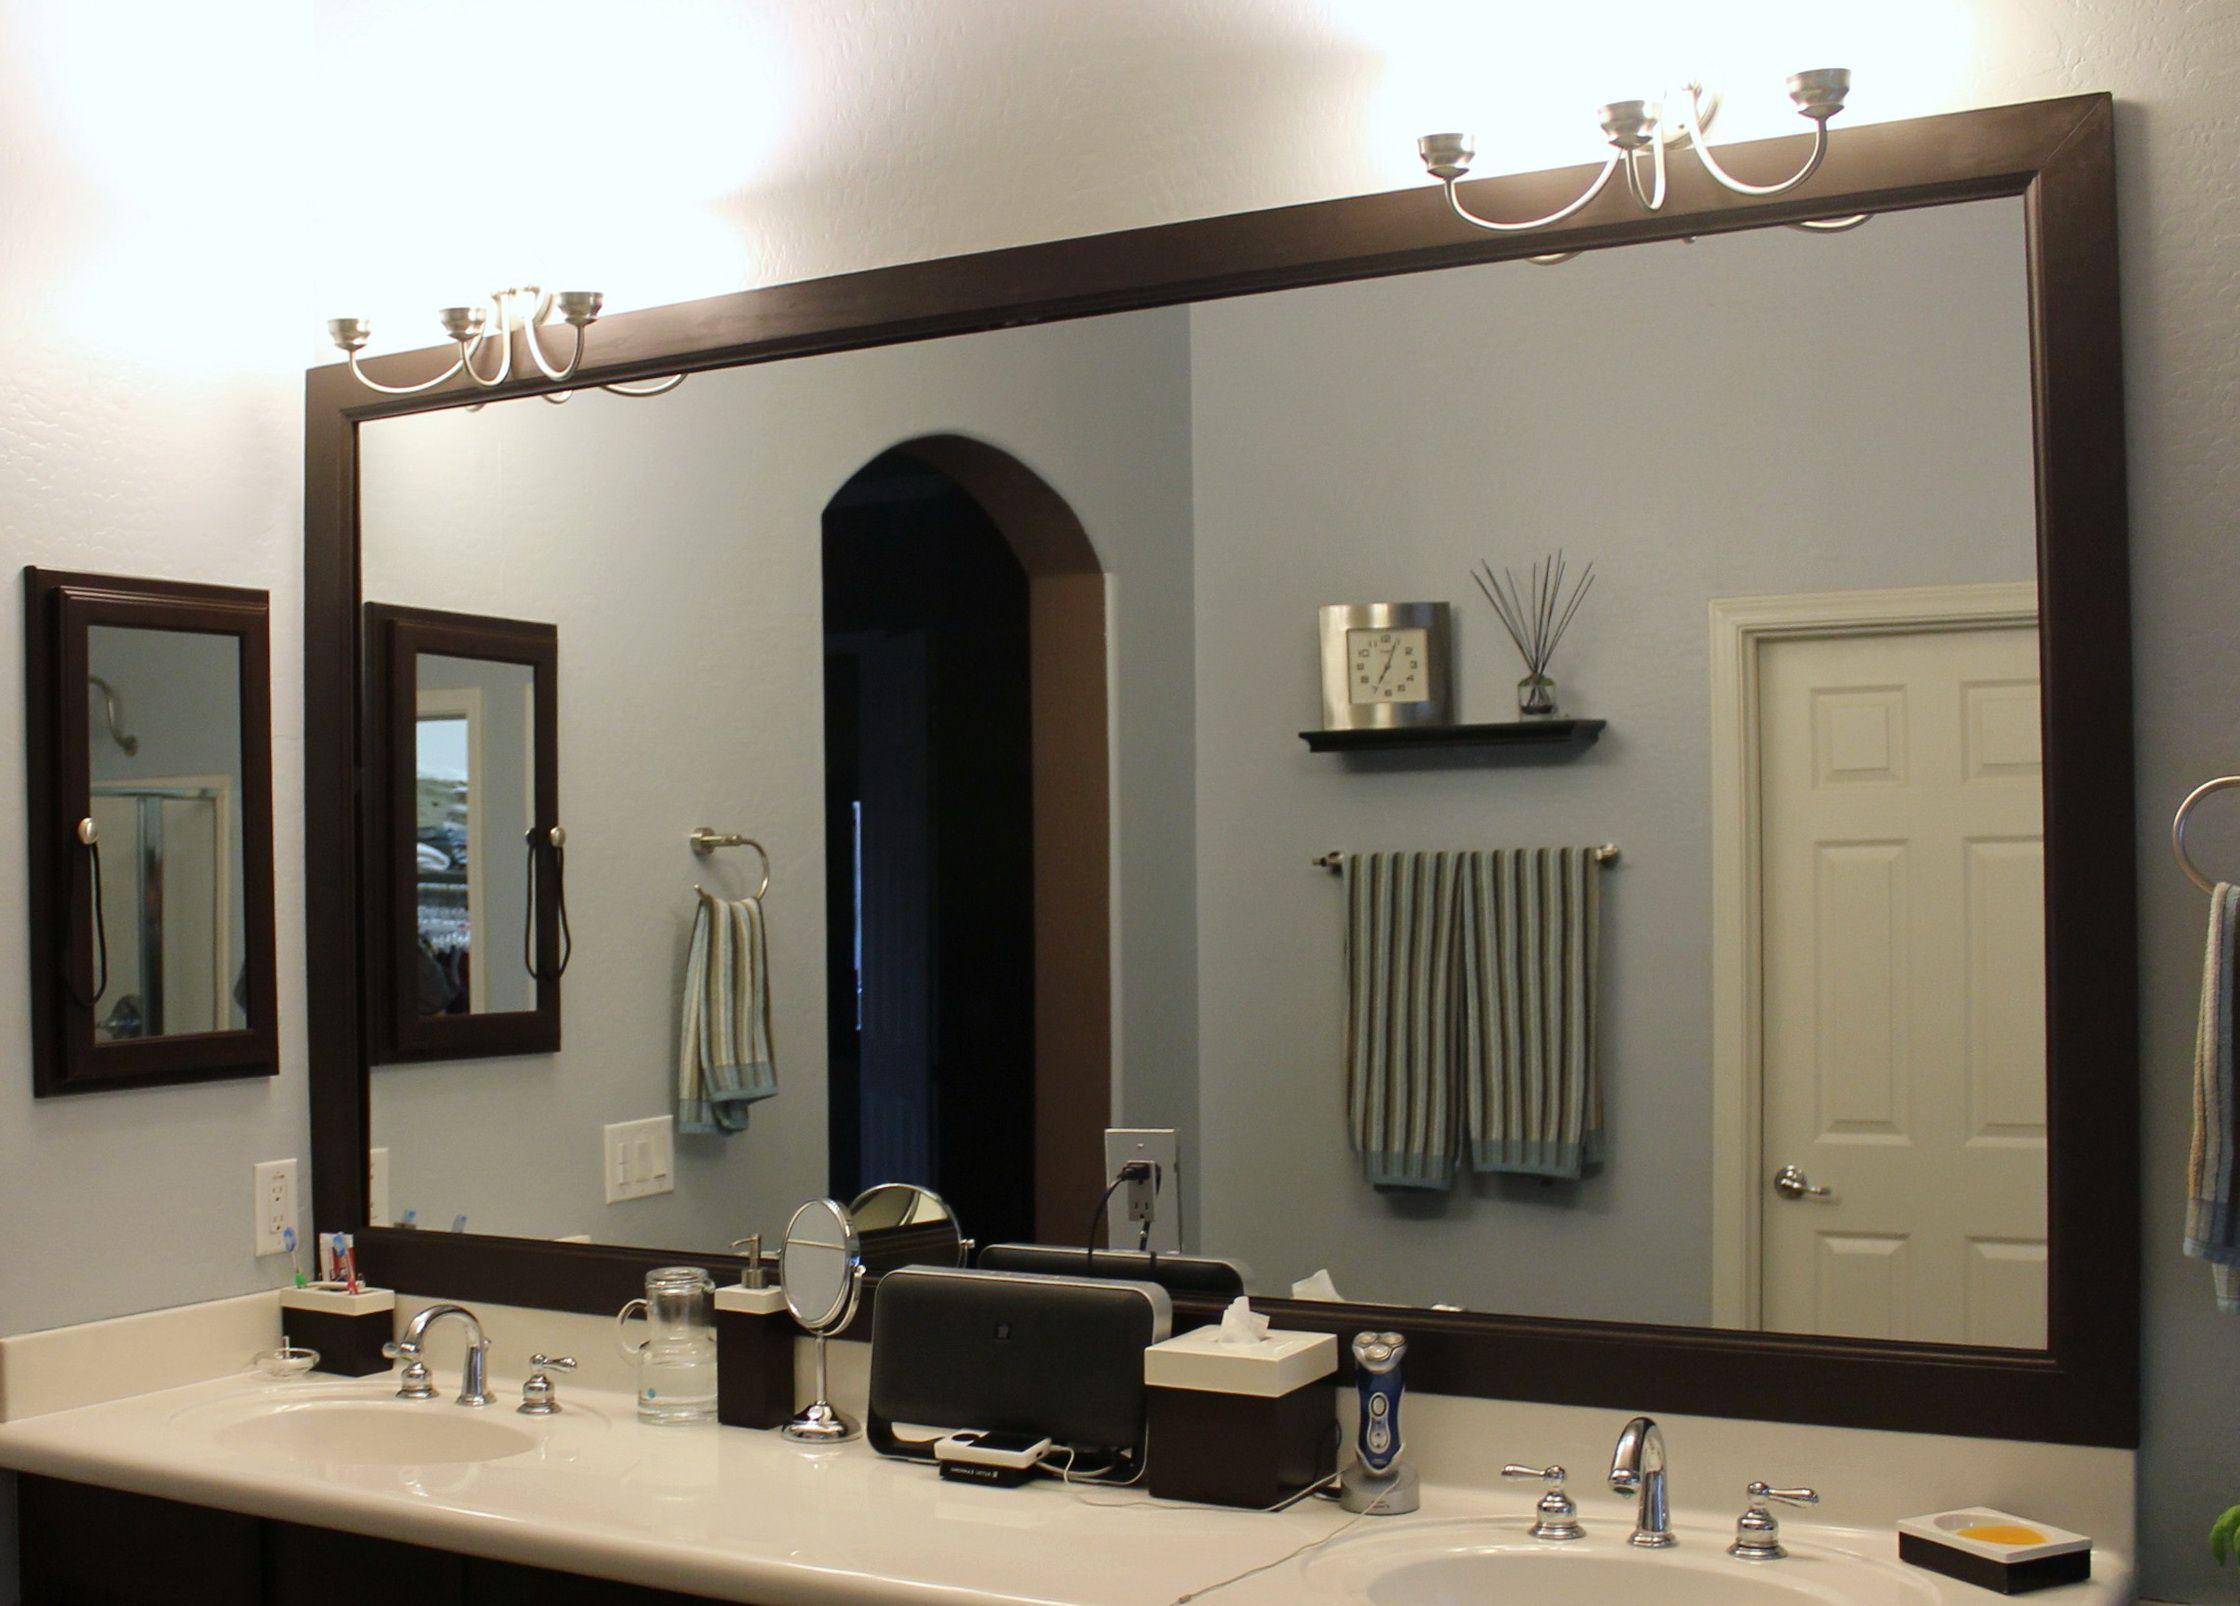 Unusual Framing Bathroom Mirror Diy Along With Framing A Bathroom